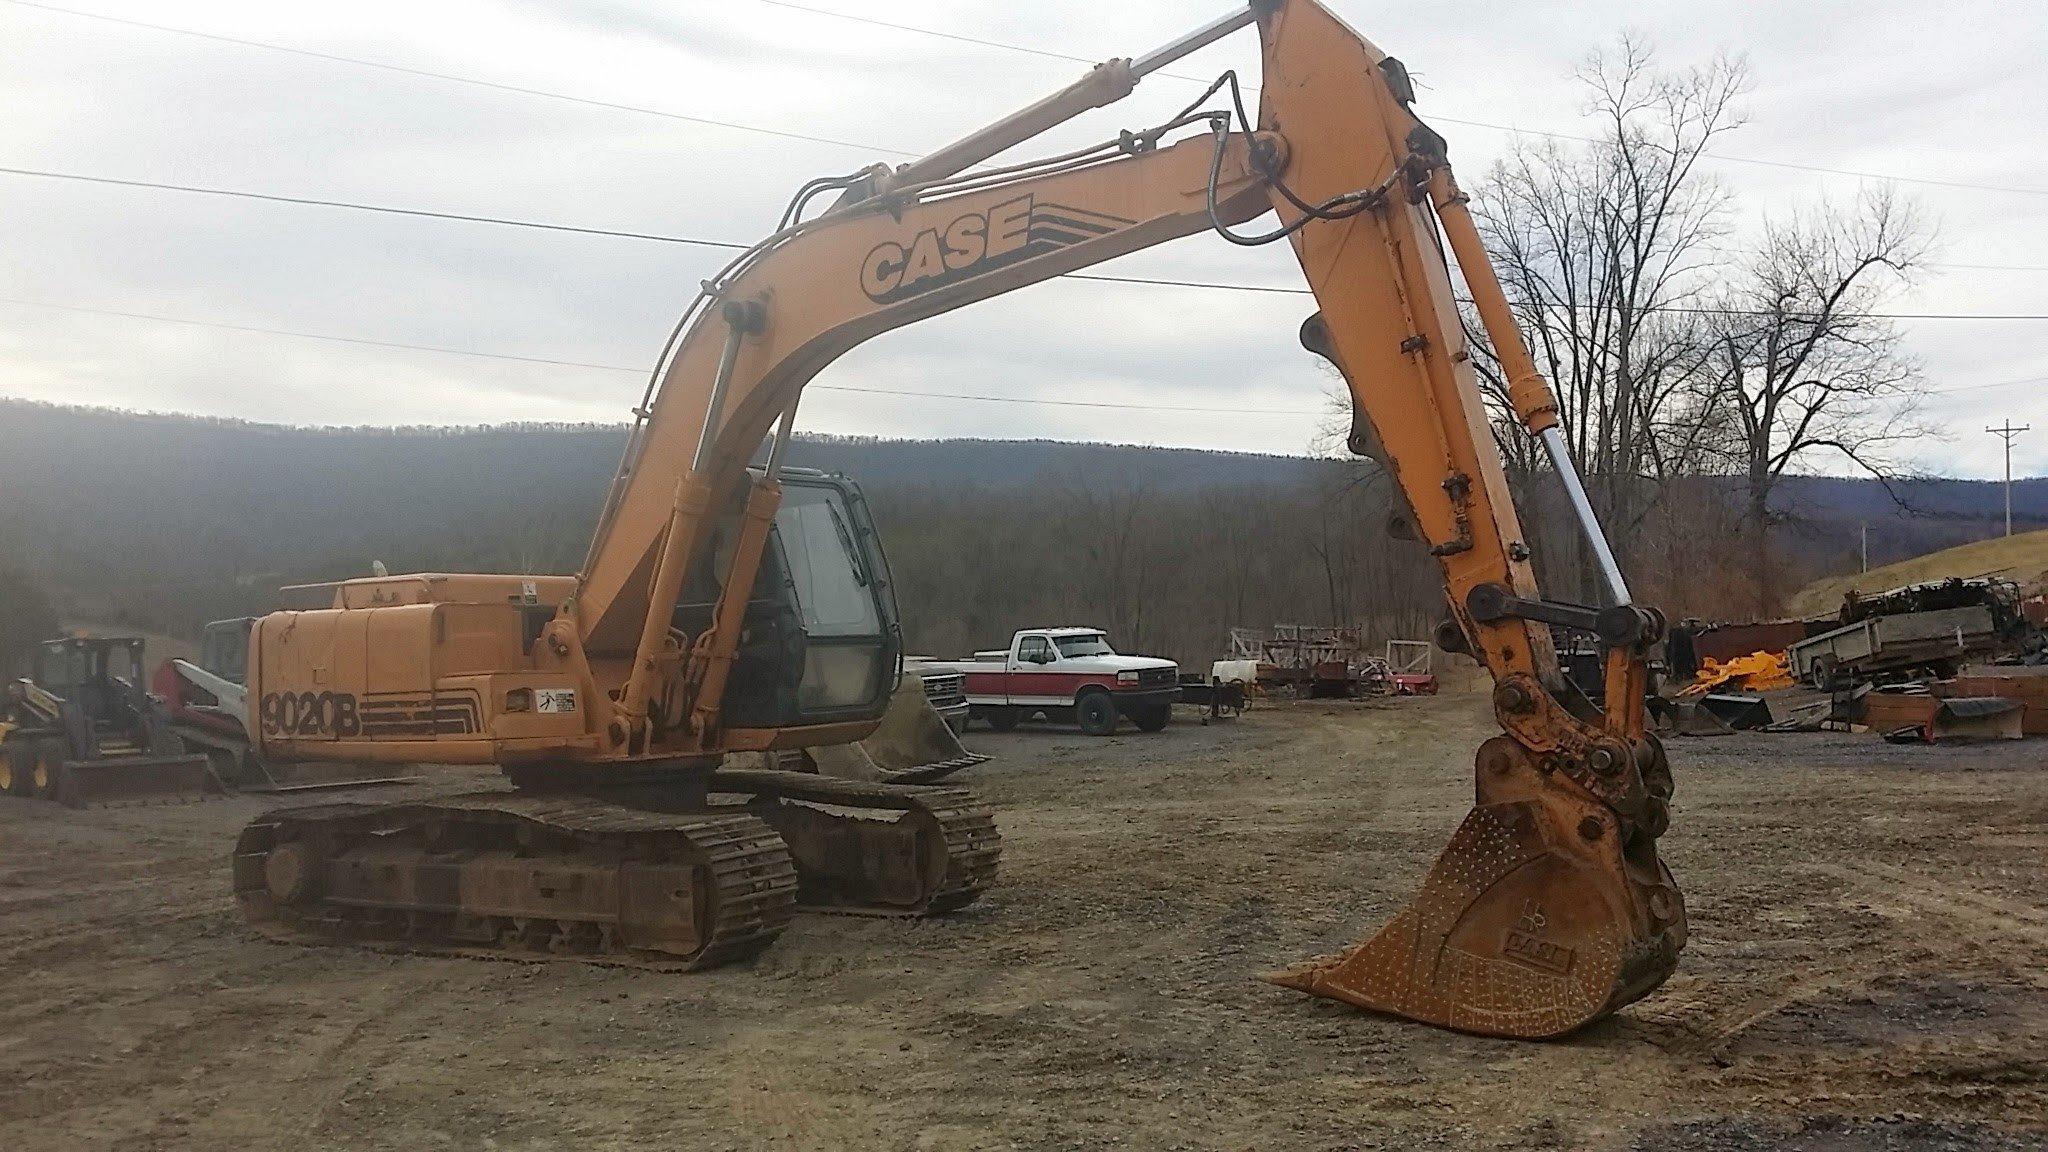 case 9020b excavator maintenance workshop service manual rh automotive manual com Case 9040 Excavator Case IH 9020